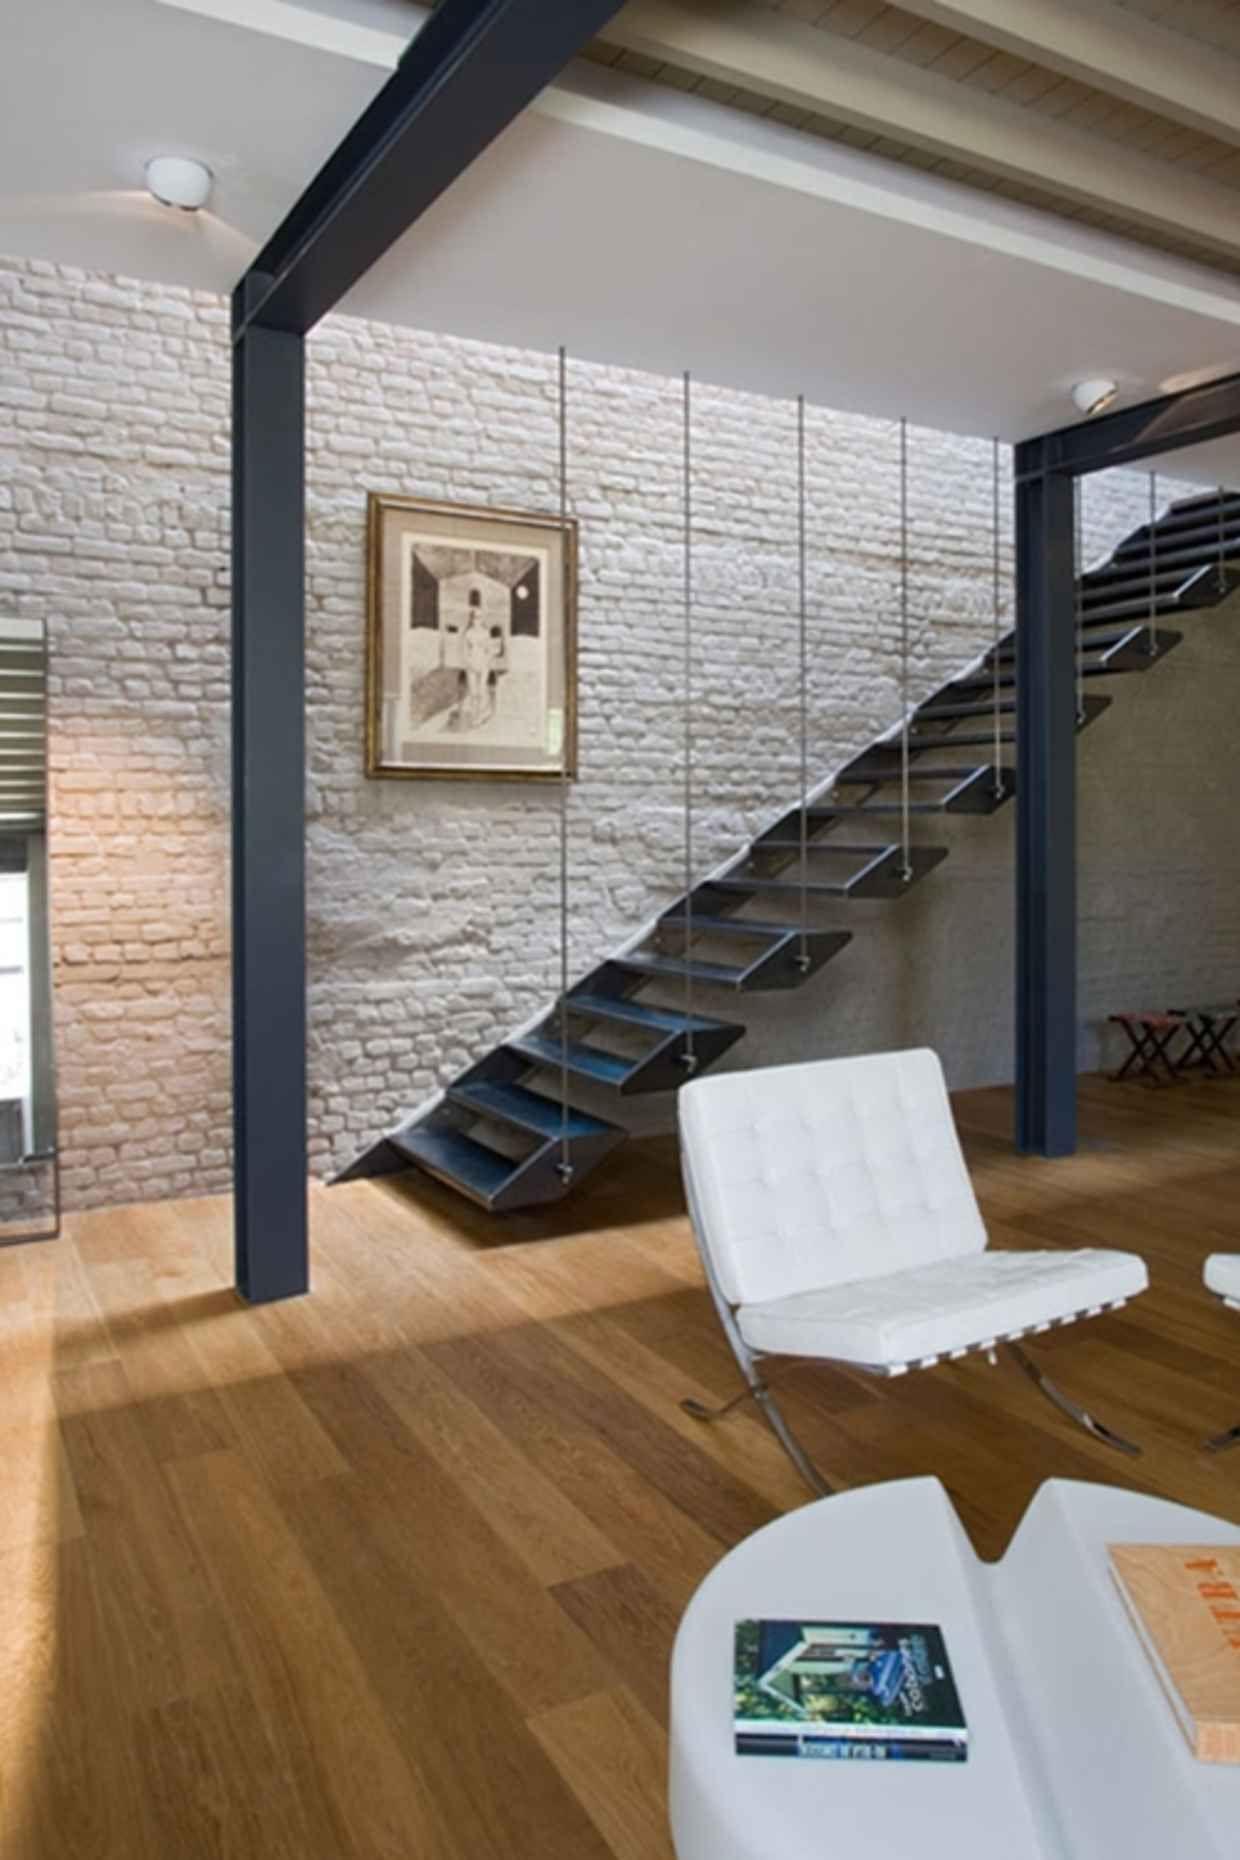 Inspiring Examples Of Minimal Interior Design 3